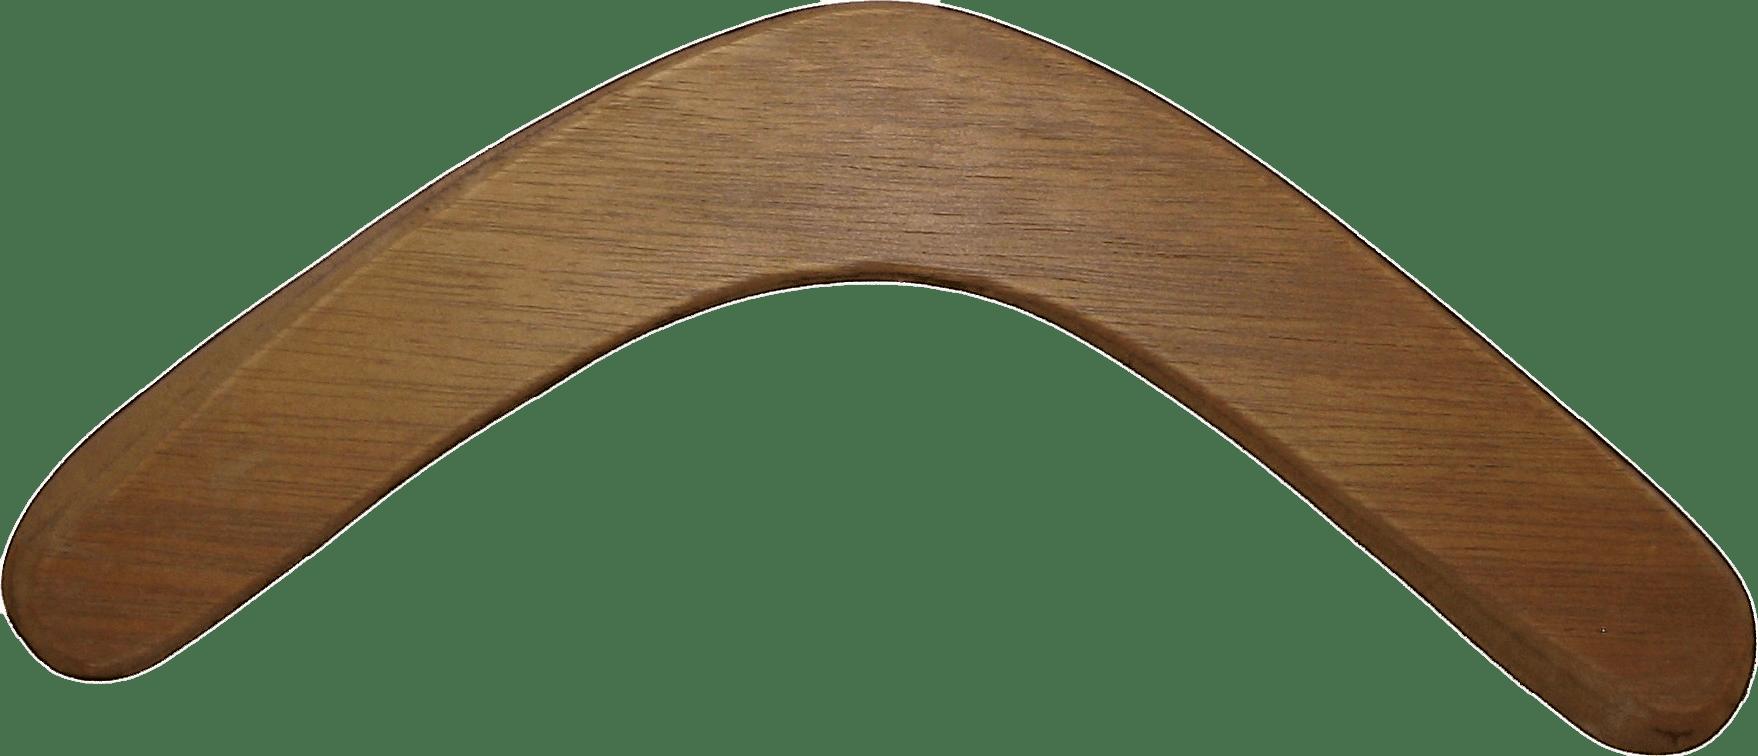 Blank Wooden Boomerang transparent PNG.